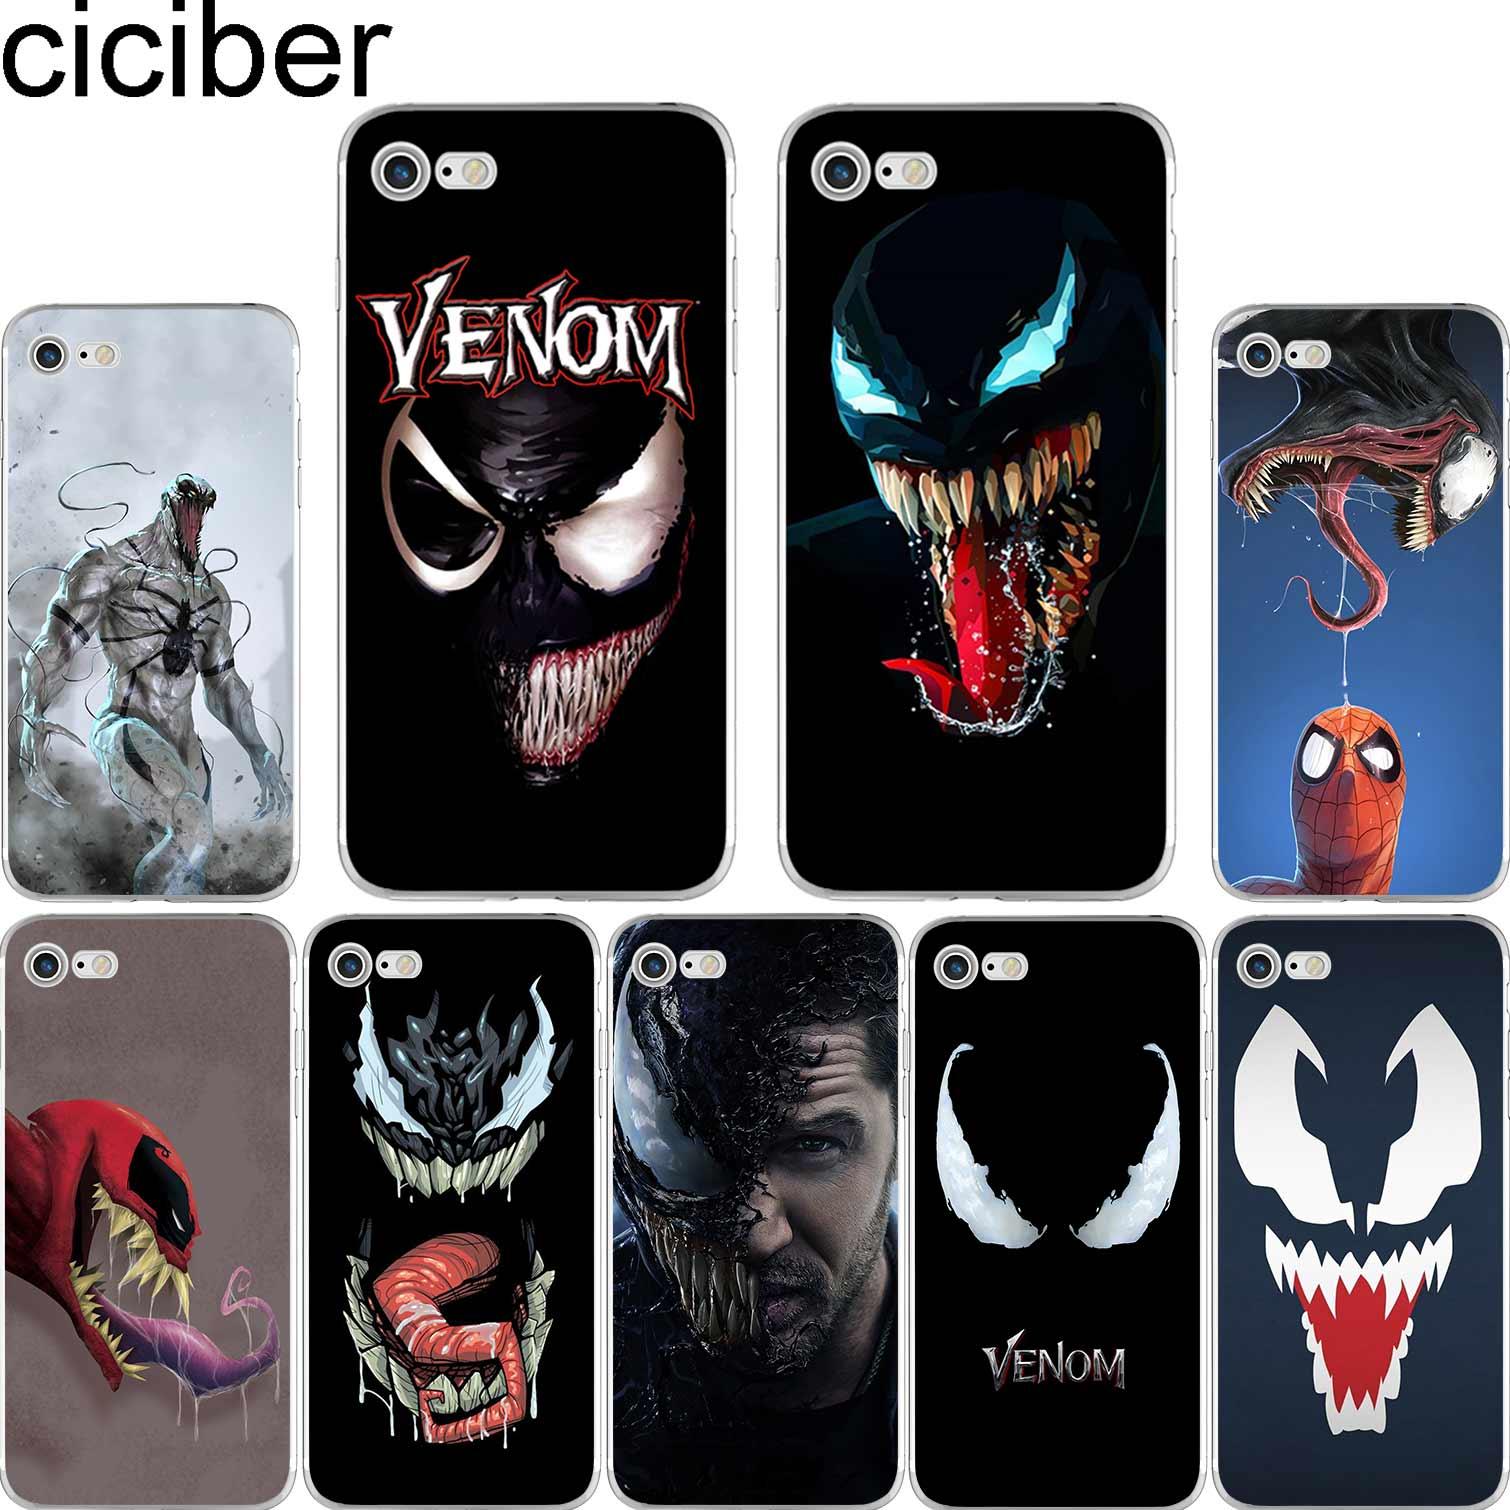 ciciber Villain Marvel Venom Soft Silicon Phone Cases Cover for IPhone 6 6S 7 8 Plus 5S SE X XS XR Mas Capinha Fundas Capa iPhone